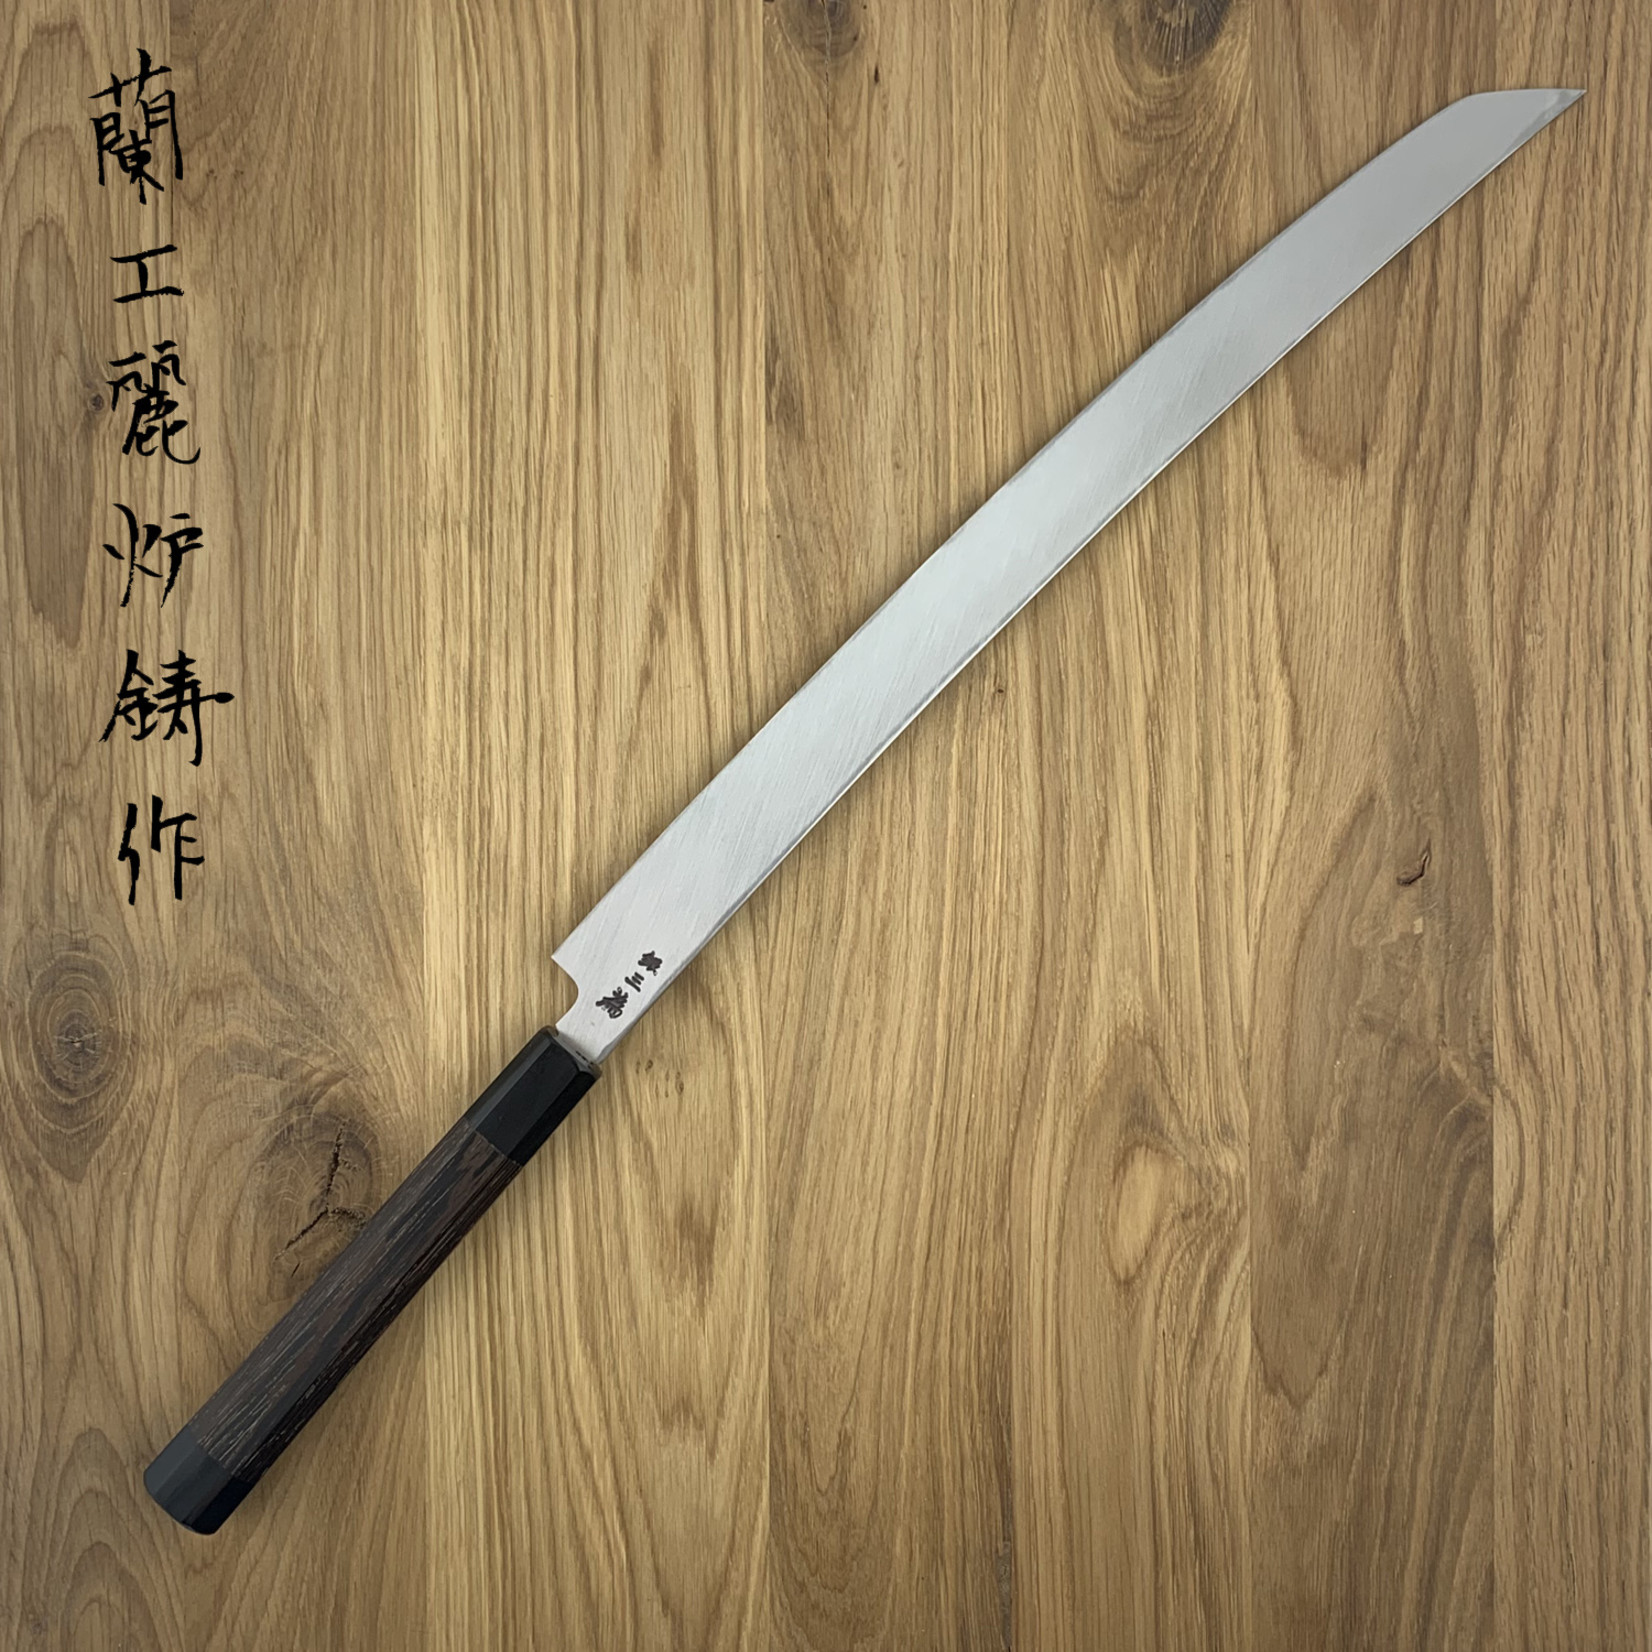 SAKAI TAKAYUKI Zangetsu mikazuki 390 mm gin san wenge 4237